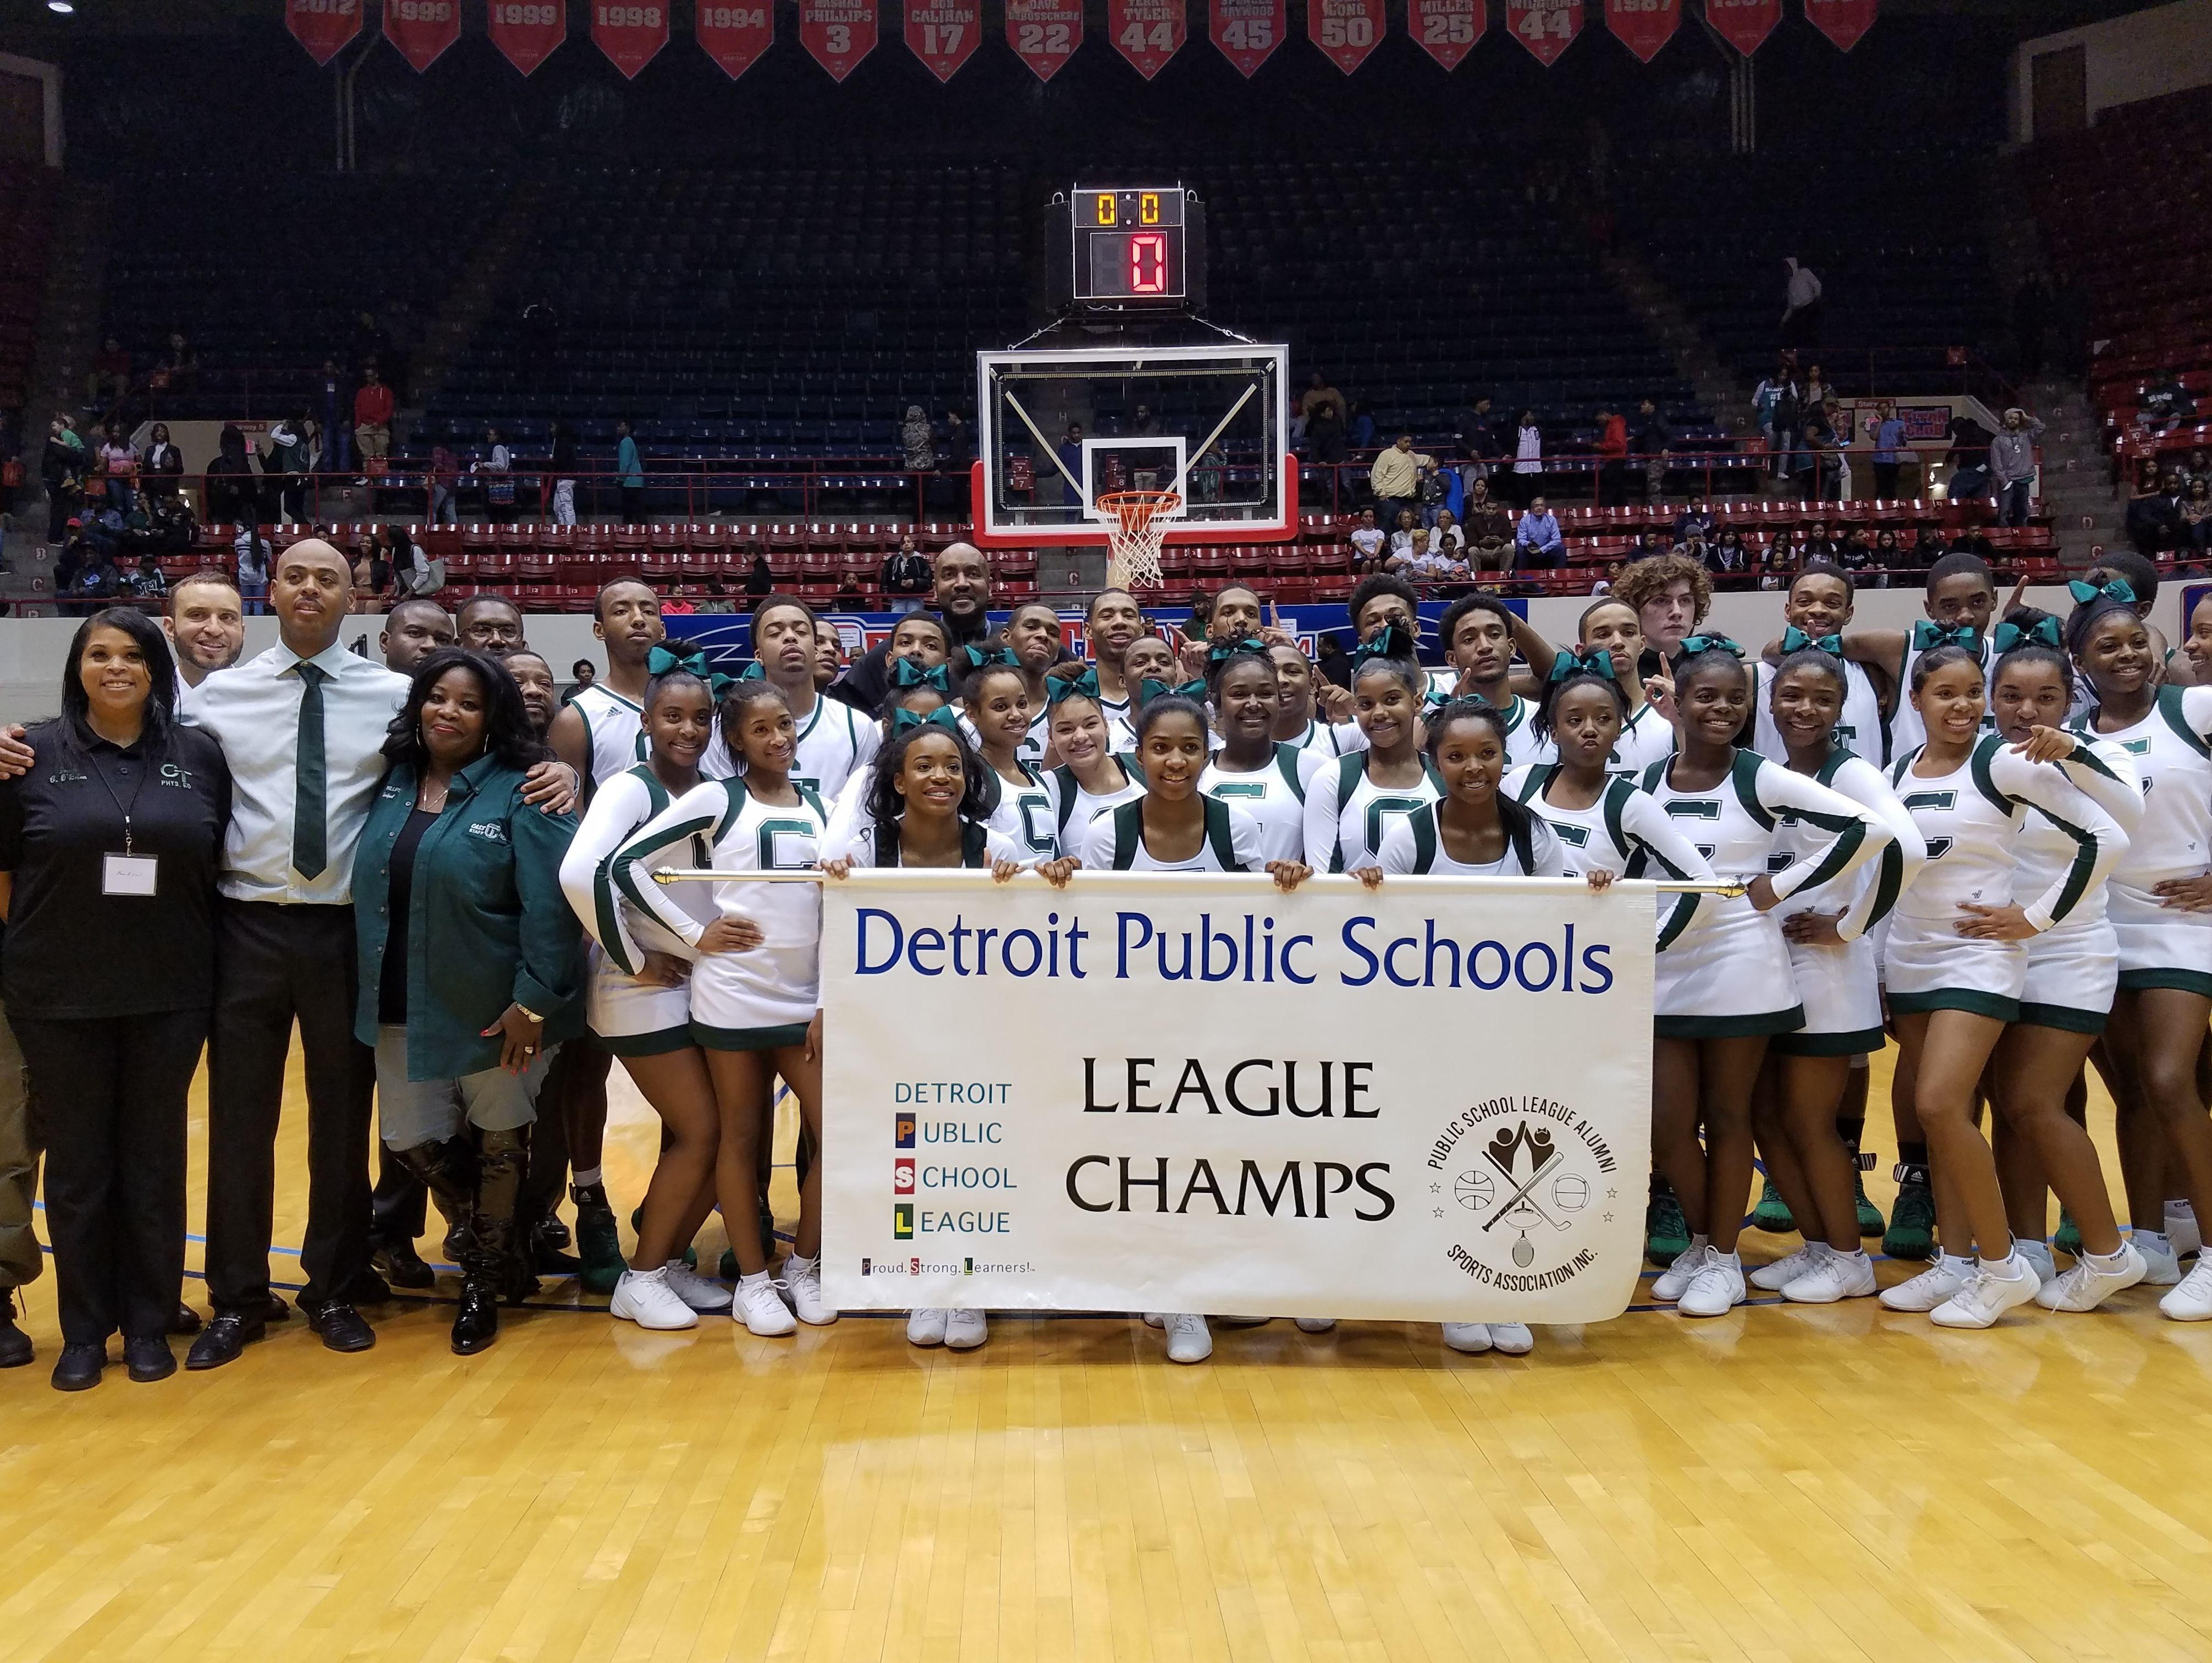 Members of Cass Tech's boys basketball team celebrate winning their first Detroit Public Schools League championship since 1998 on Saturday, Feb. 18, 2017, at Calihan Hall. The Technicians beat Detroit King, 59-47.